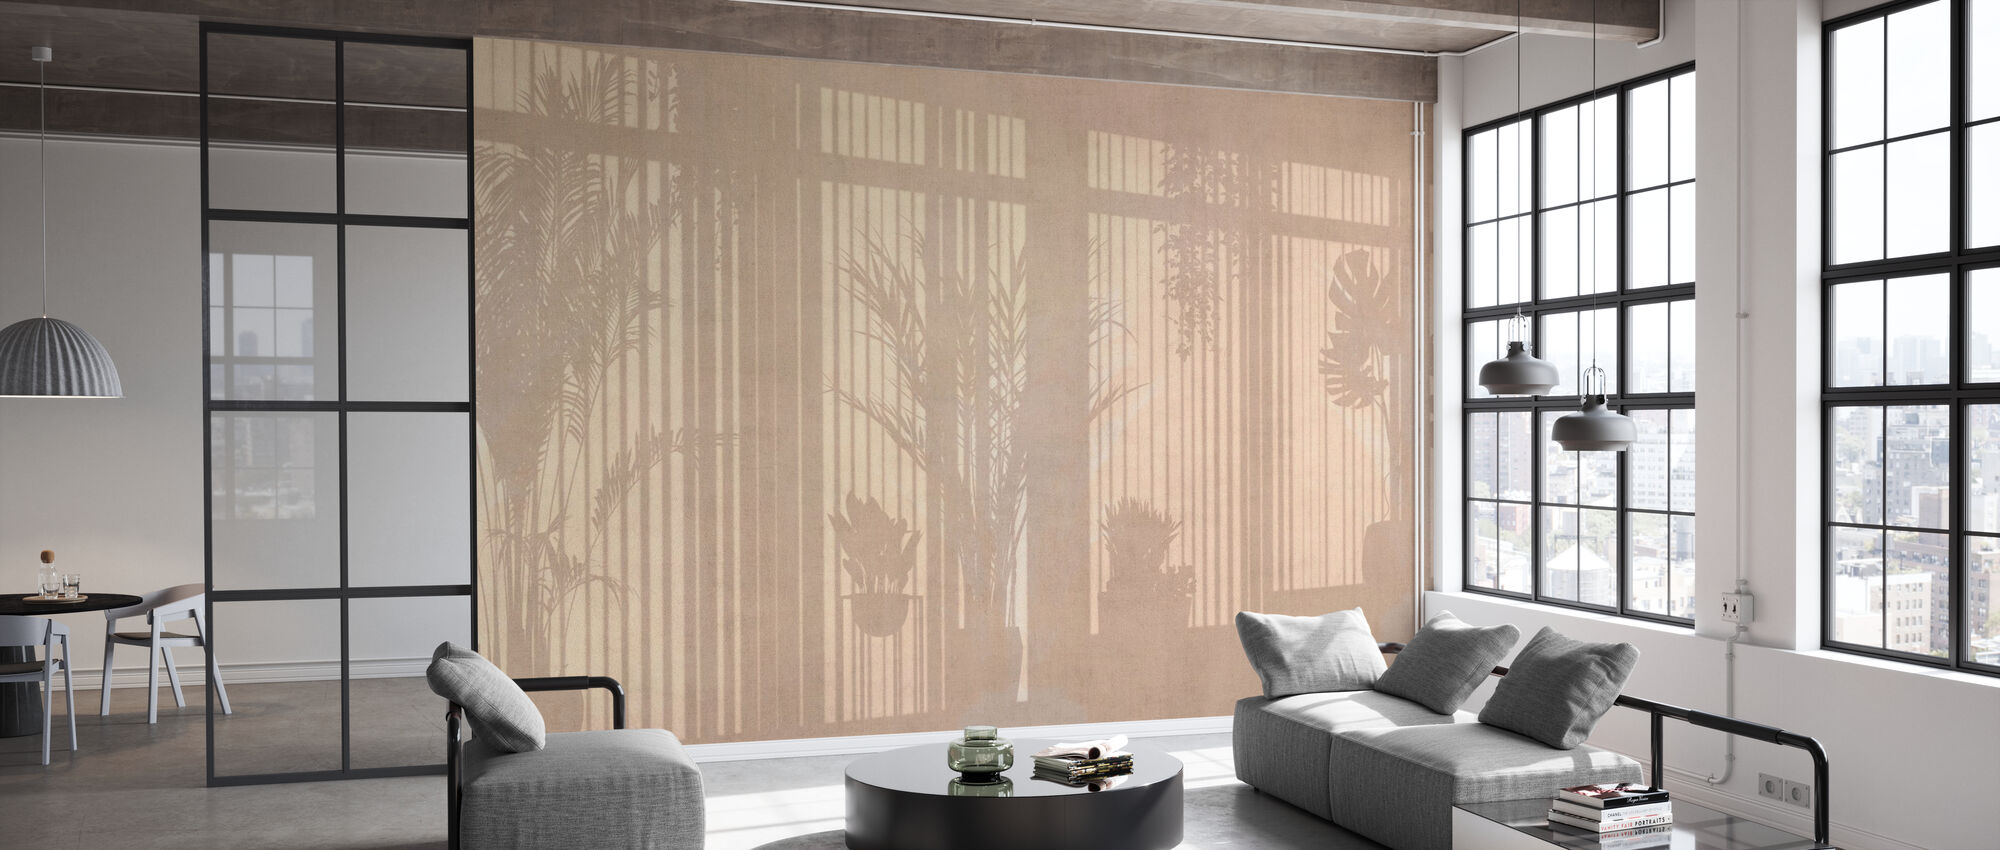 Sunny Window - Ochre - Wallpaper - Office